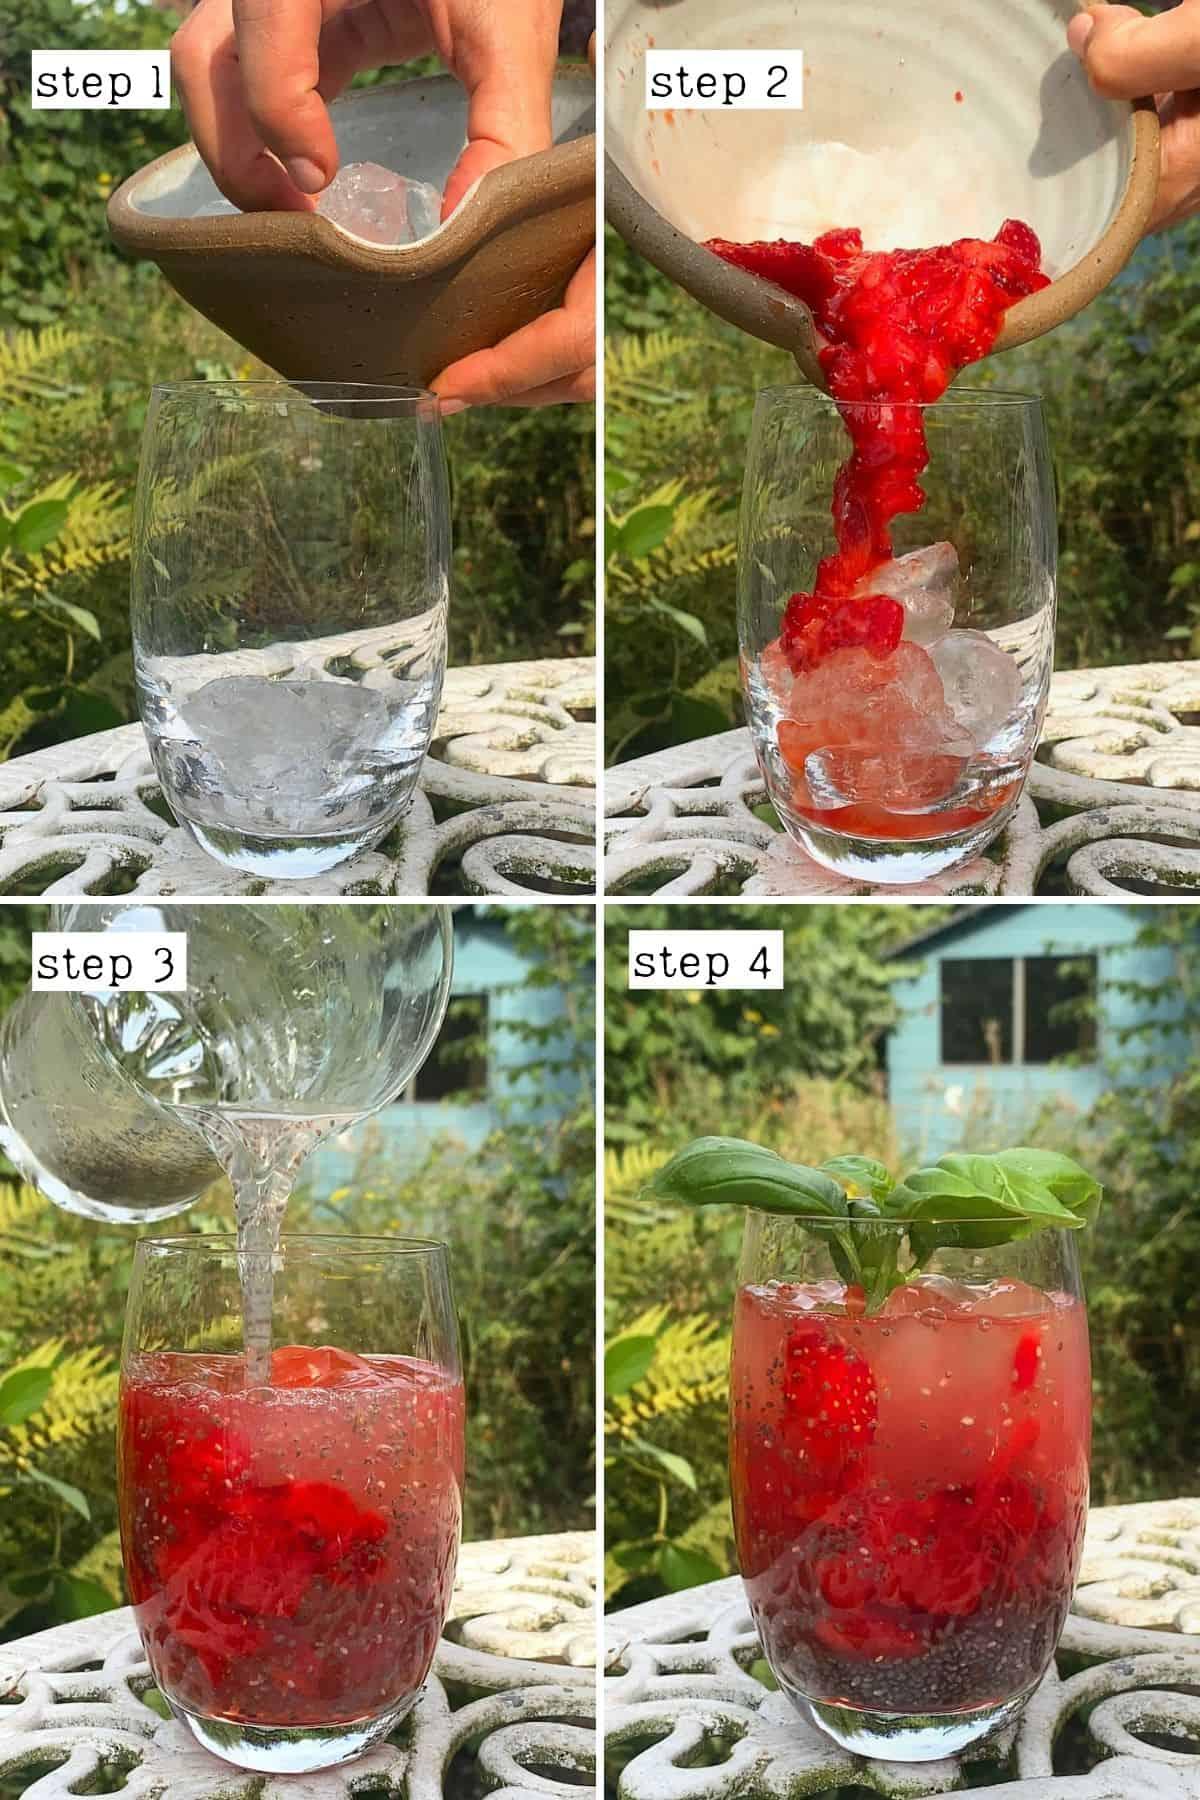 Steps for preparing chia energy drink